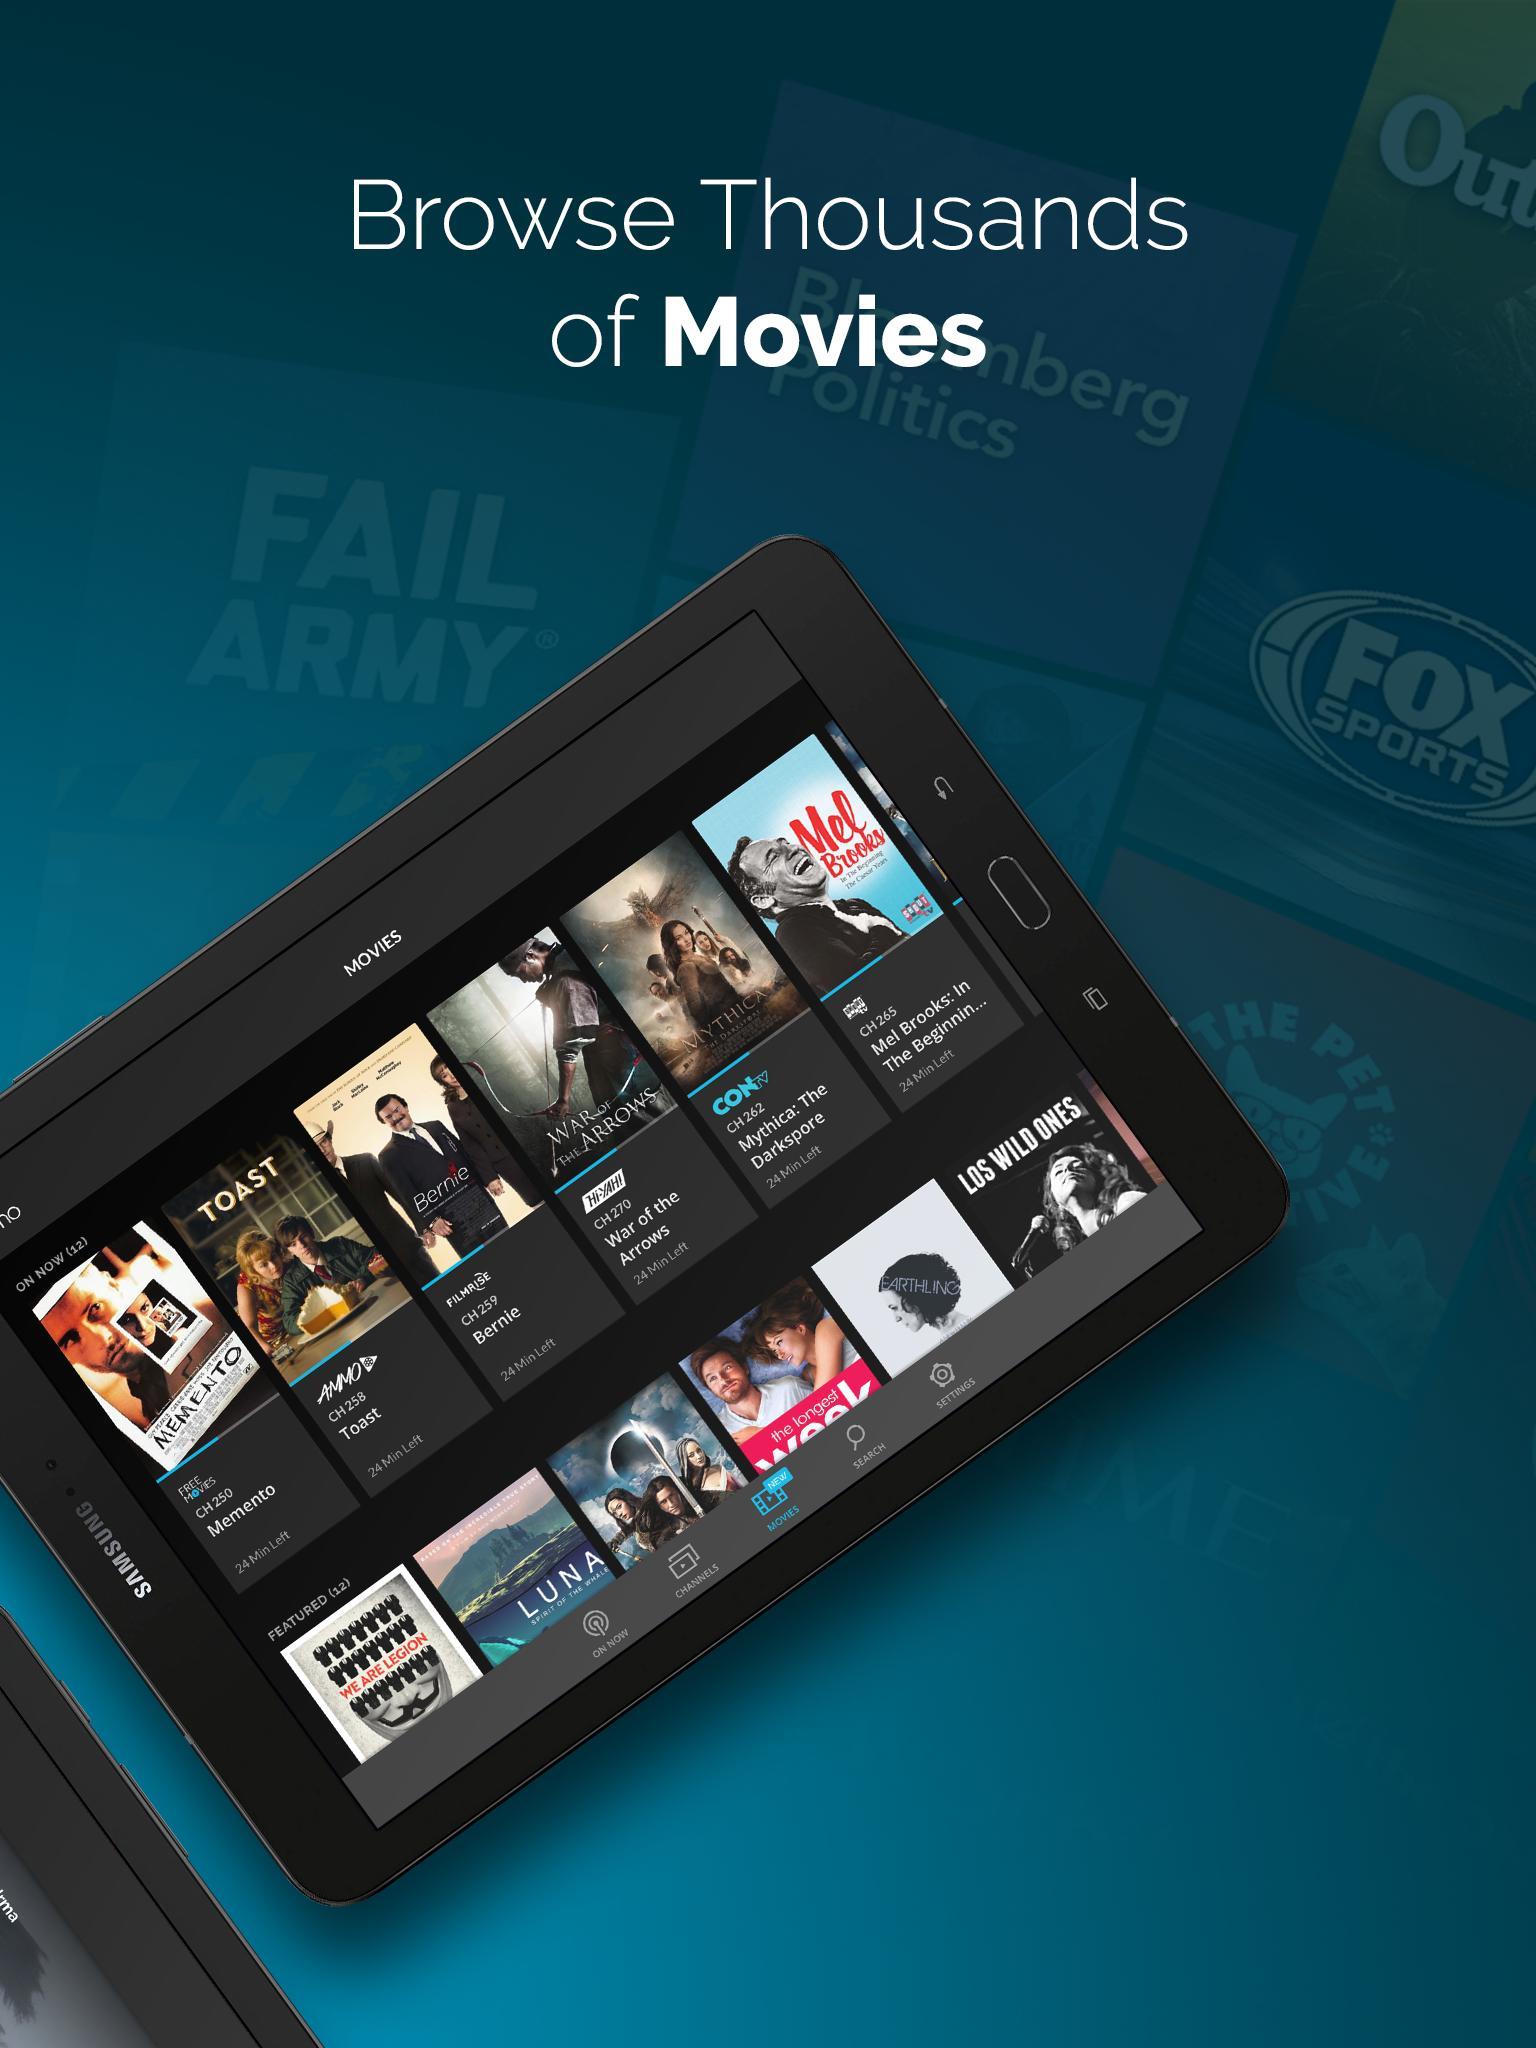 XUMO Free Streaming TV Shows and Movies 2.7.75 Screenshot 8